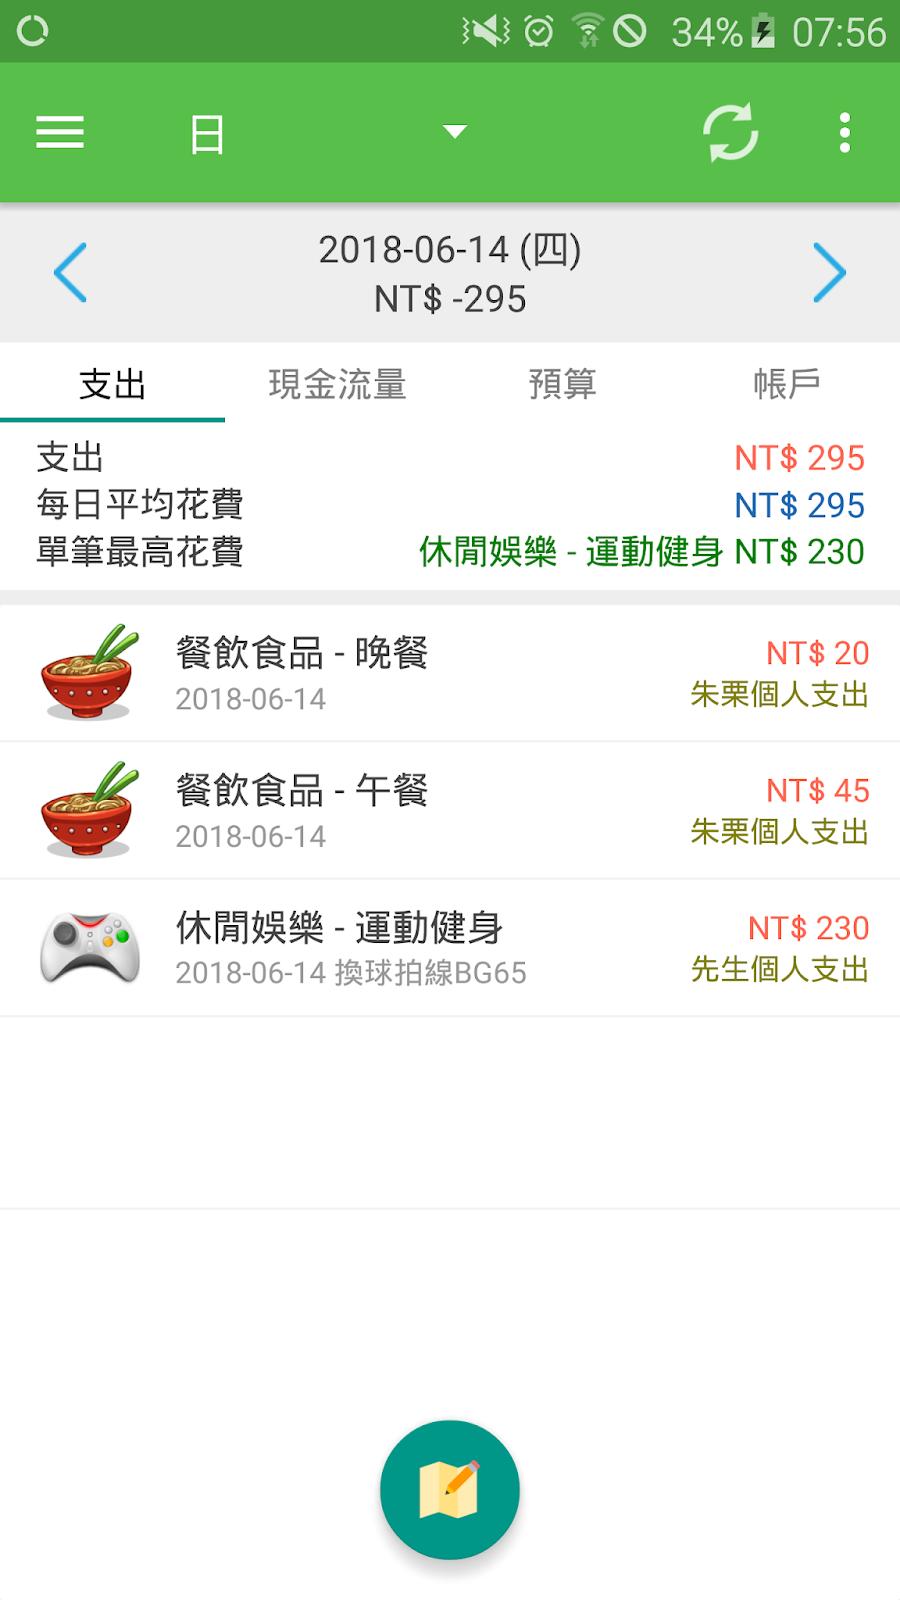 Share|《記帳 AndroMoney 理財幫手》 直覺好用的記帳 App